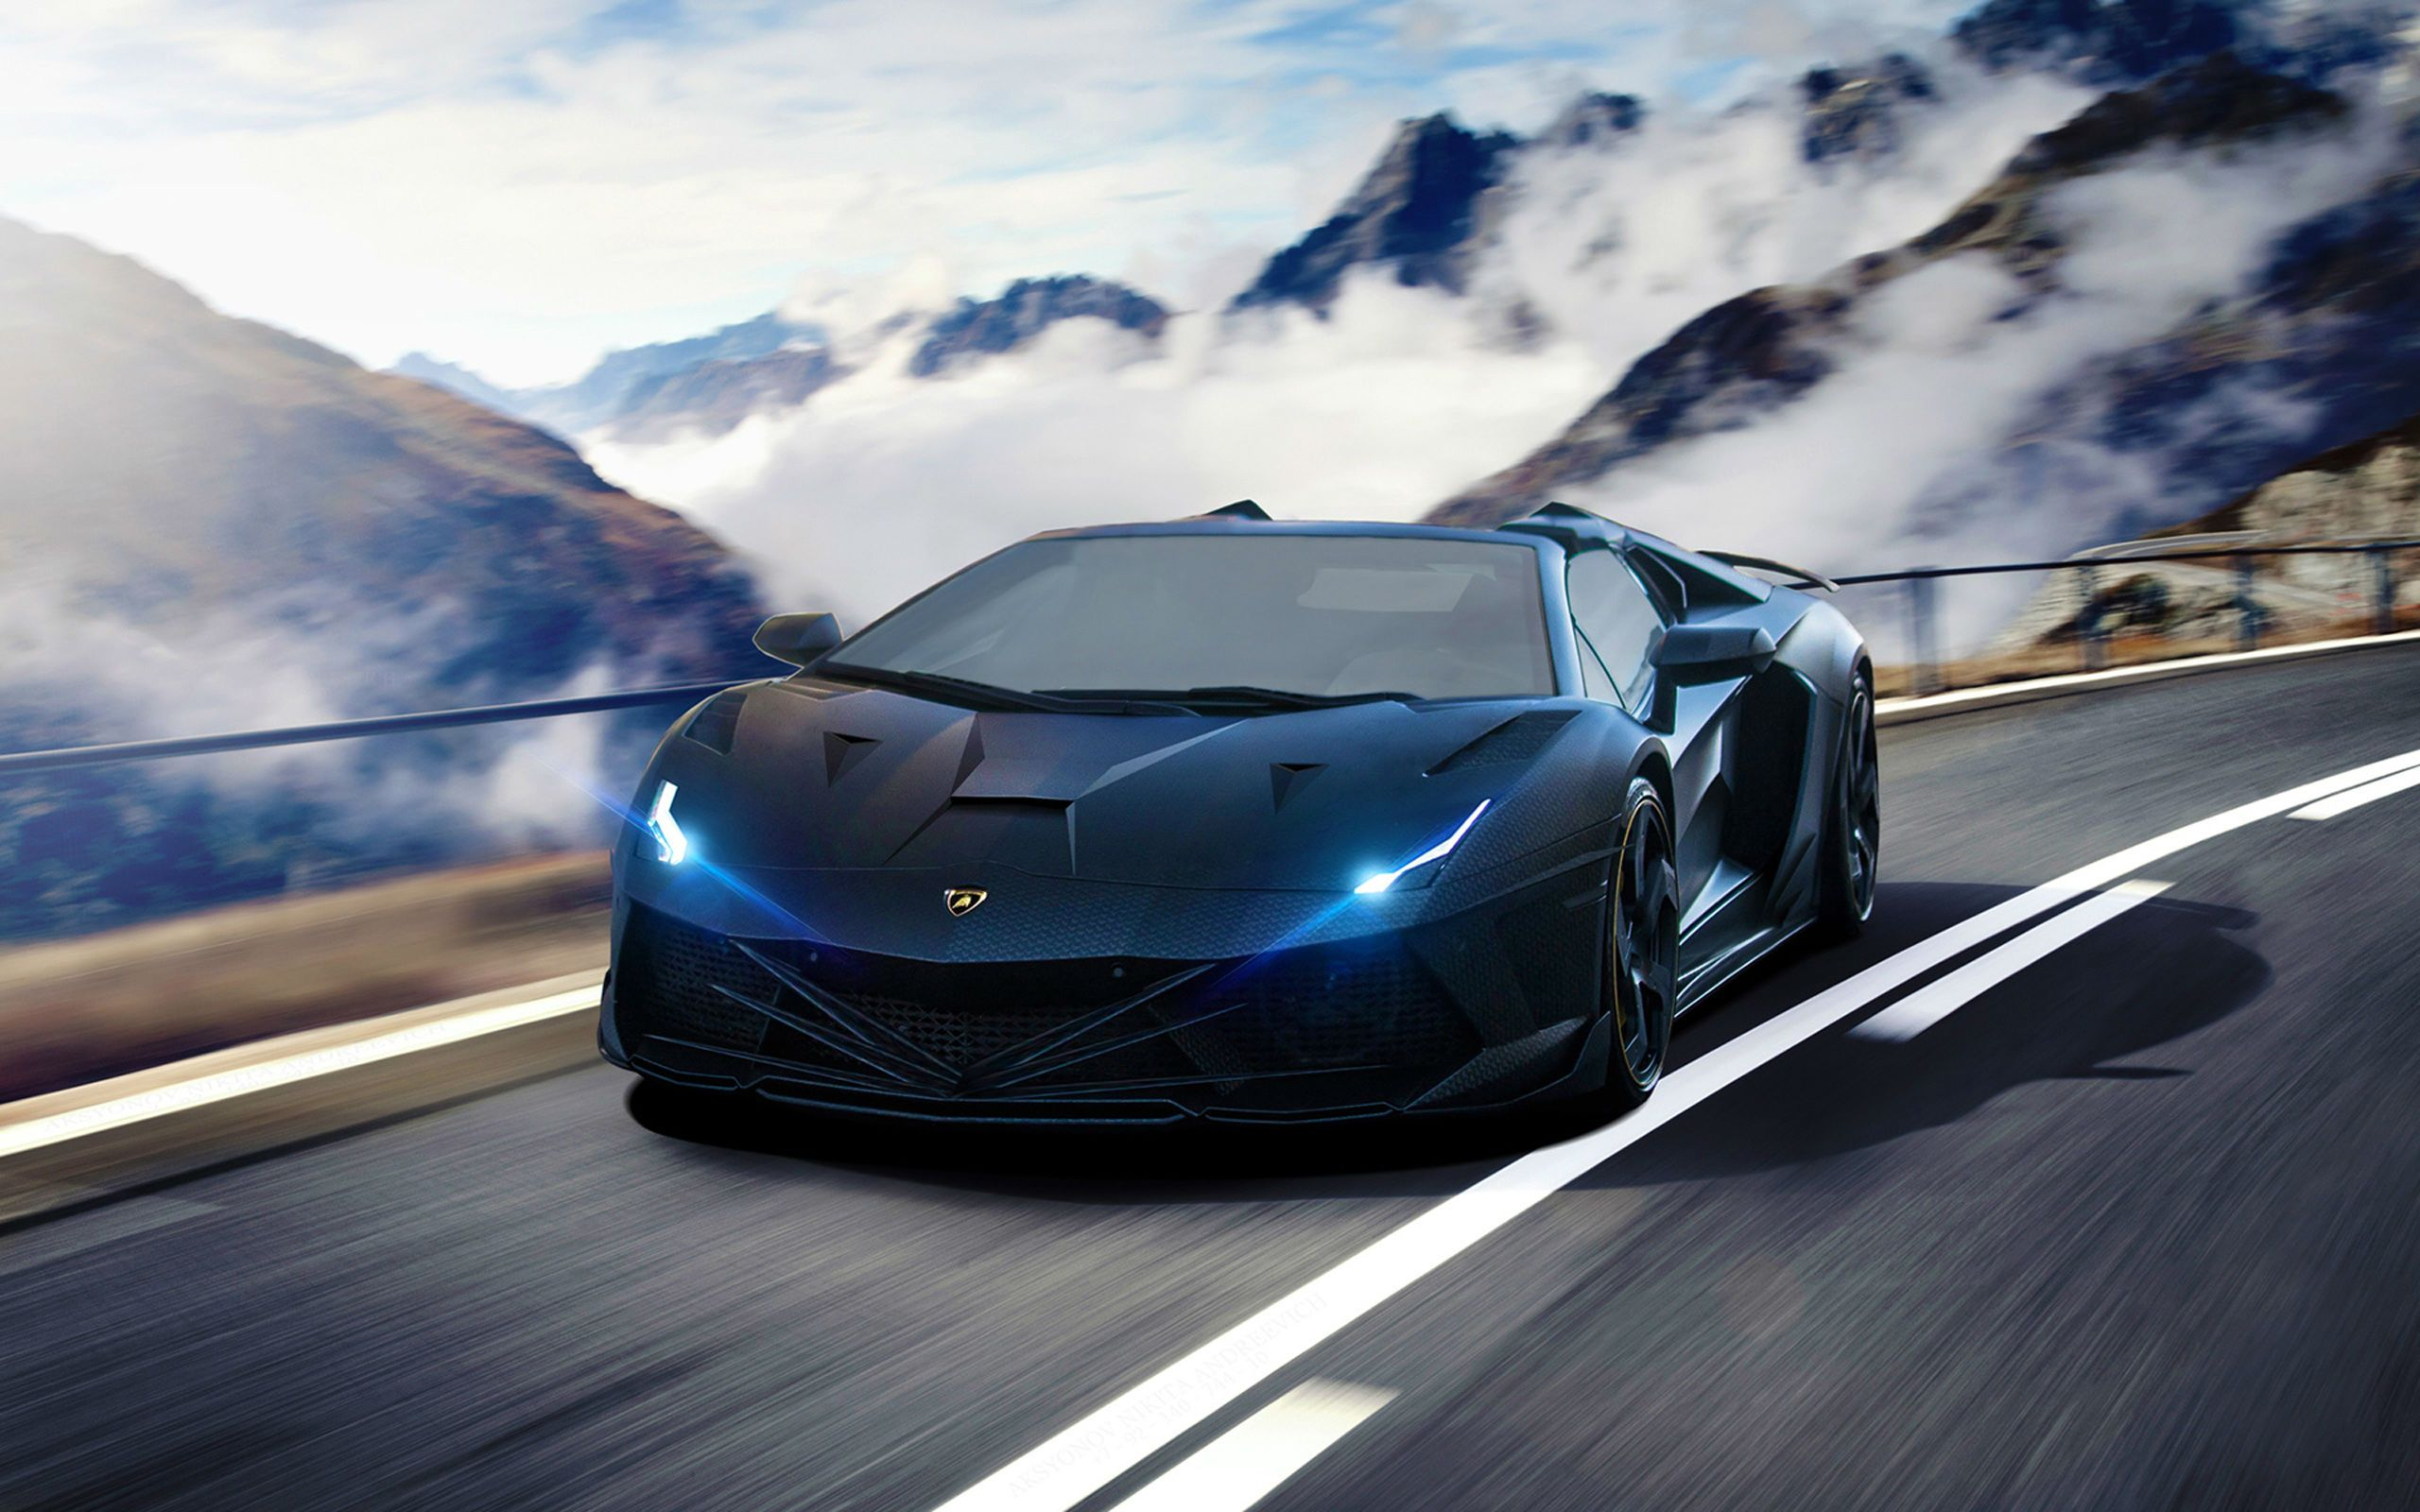 Super Cars Stunt Wallpapers Hd Hd Desktop Wallpapers Best Games